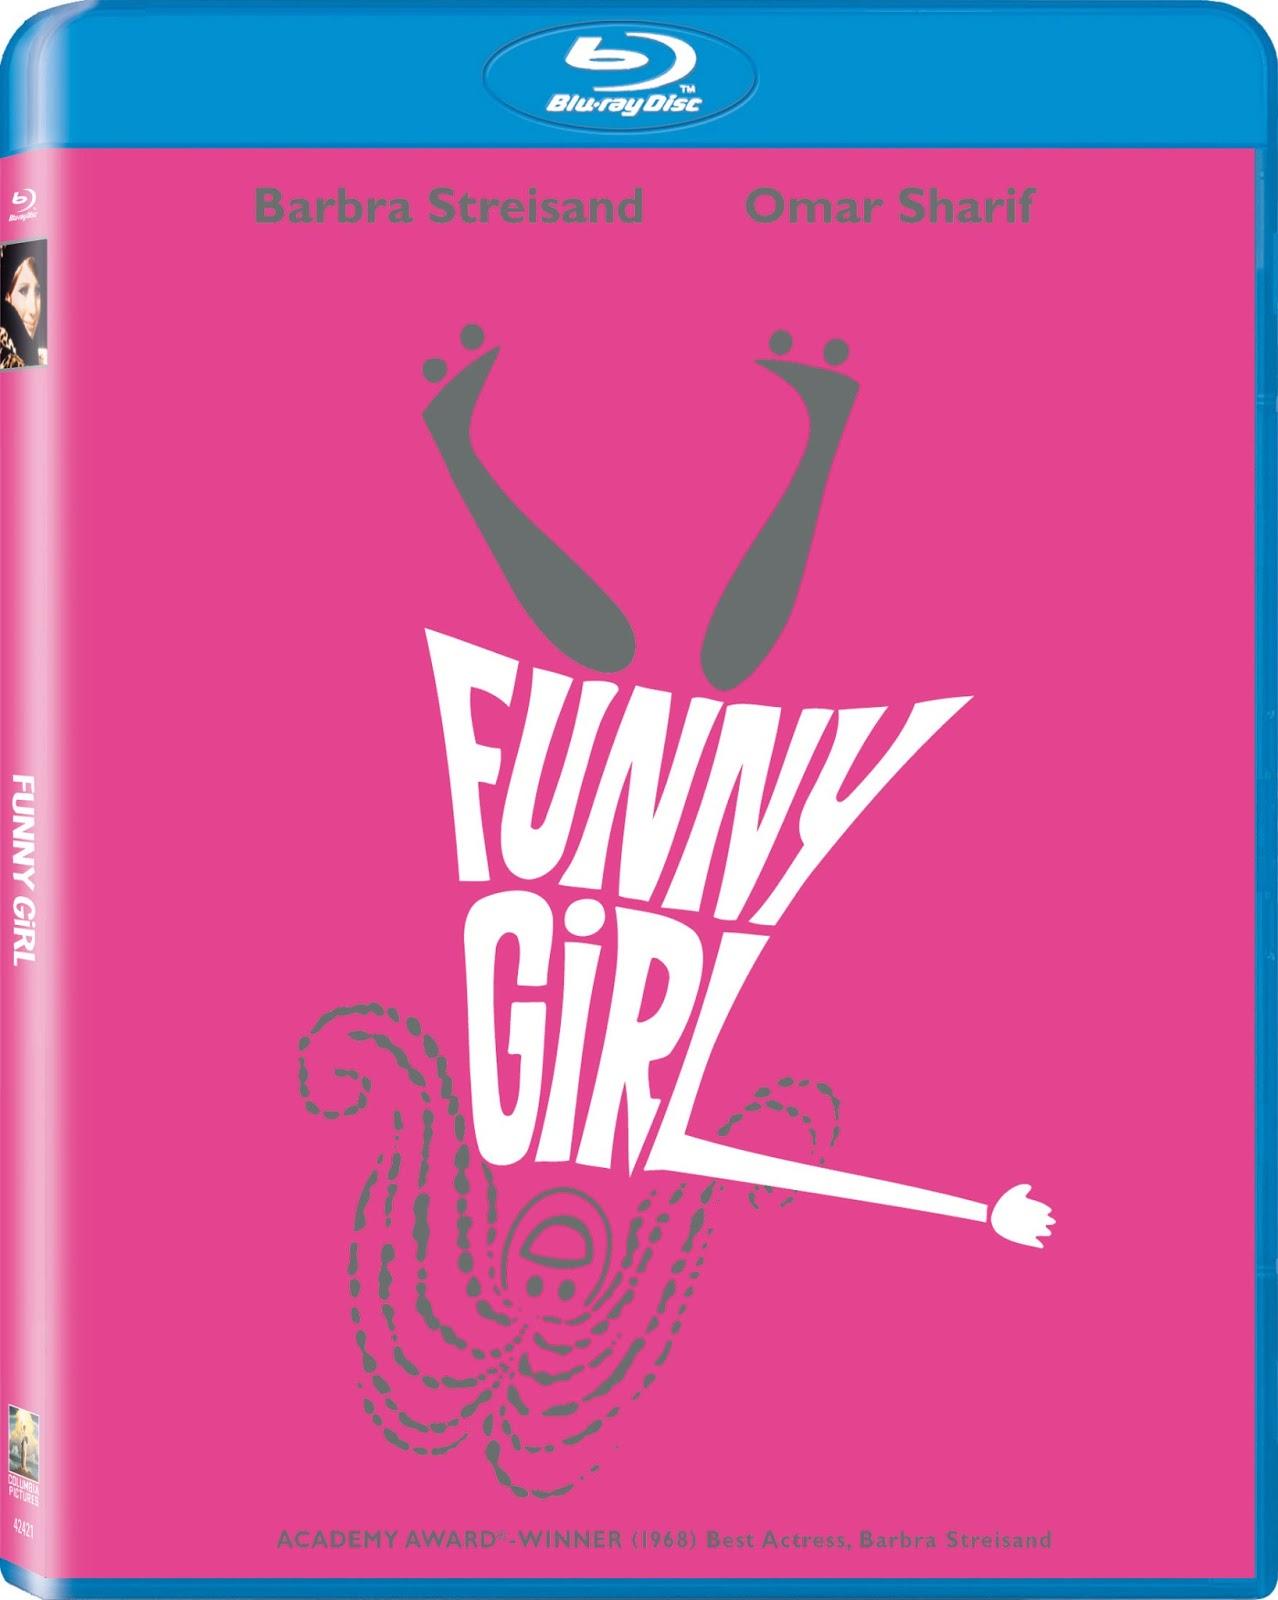 http://1.bp.blogspot.com/-tMl5WTySDeo/UVCgIPwQYoI/AAAAAAAABVU/zvt3Qf-bco4/s1600/Funny_Girl_BD.jpg